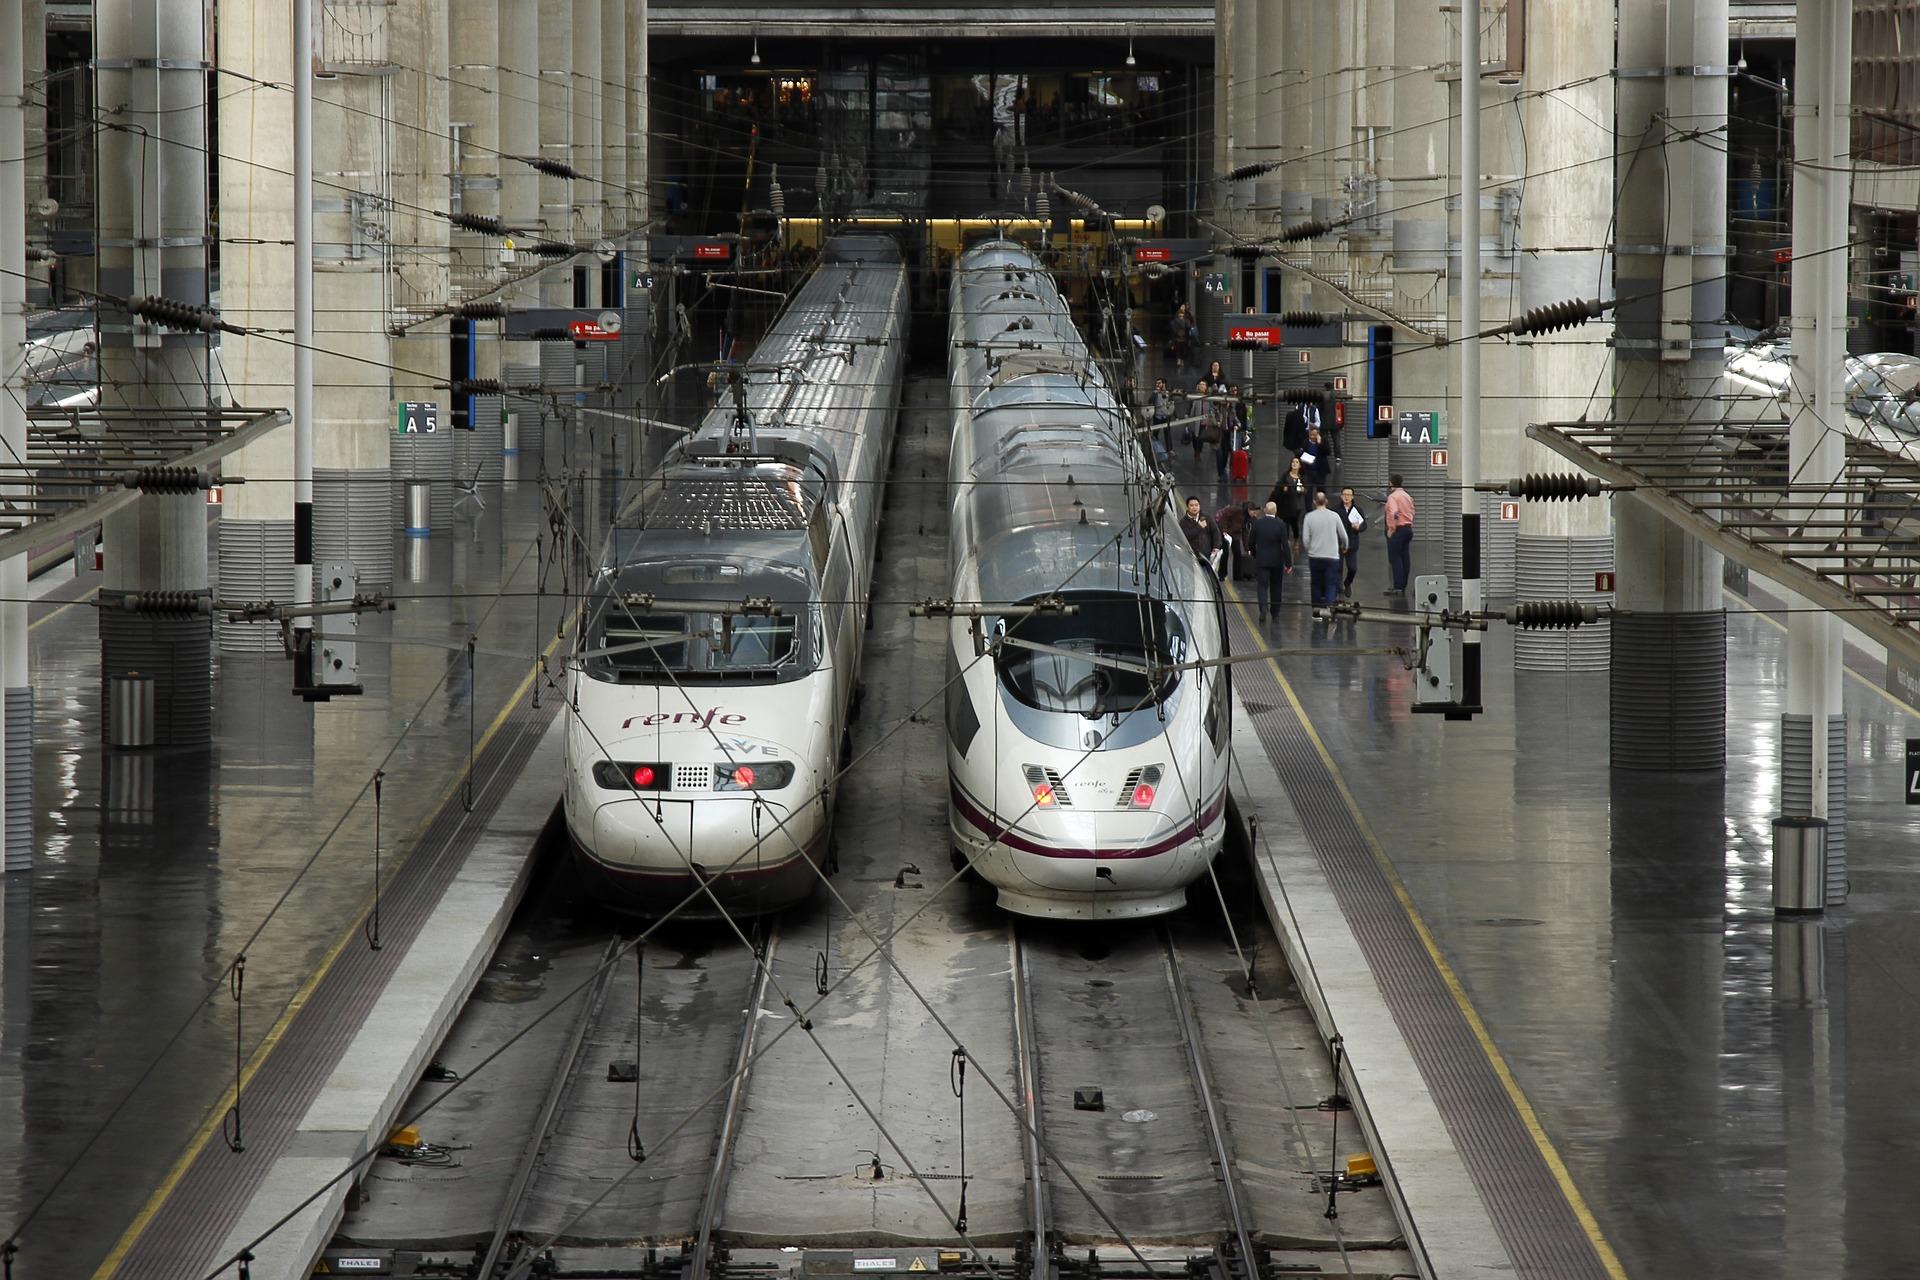 Alta Velocidad Española (AVE) trains in Madrid, Spain